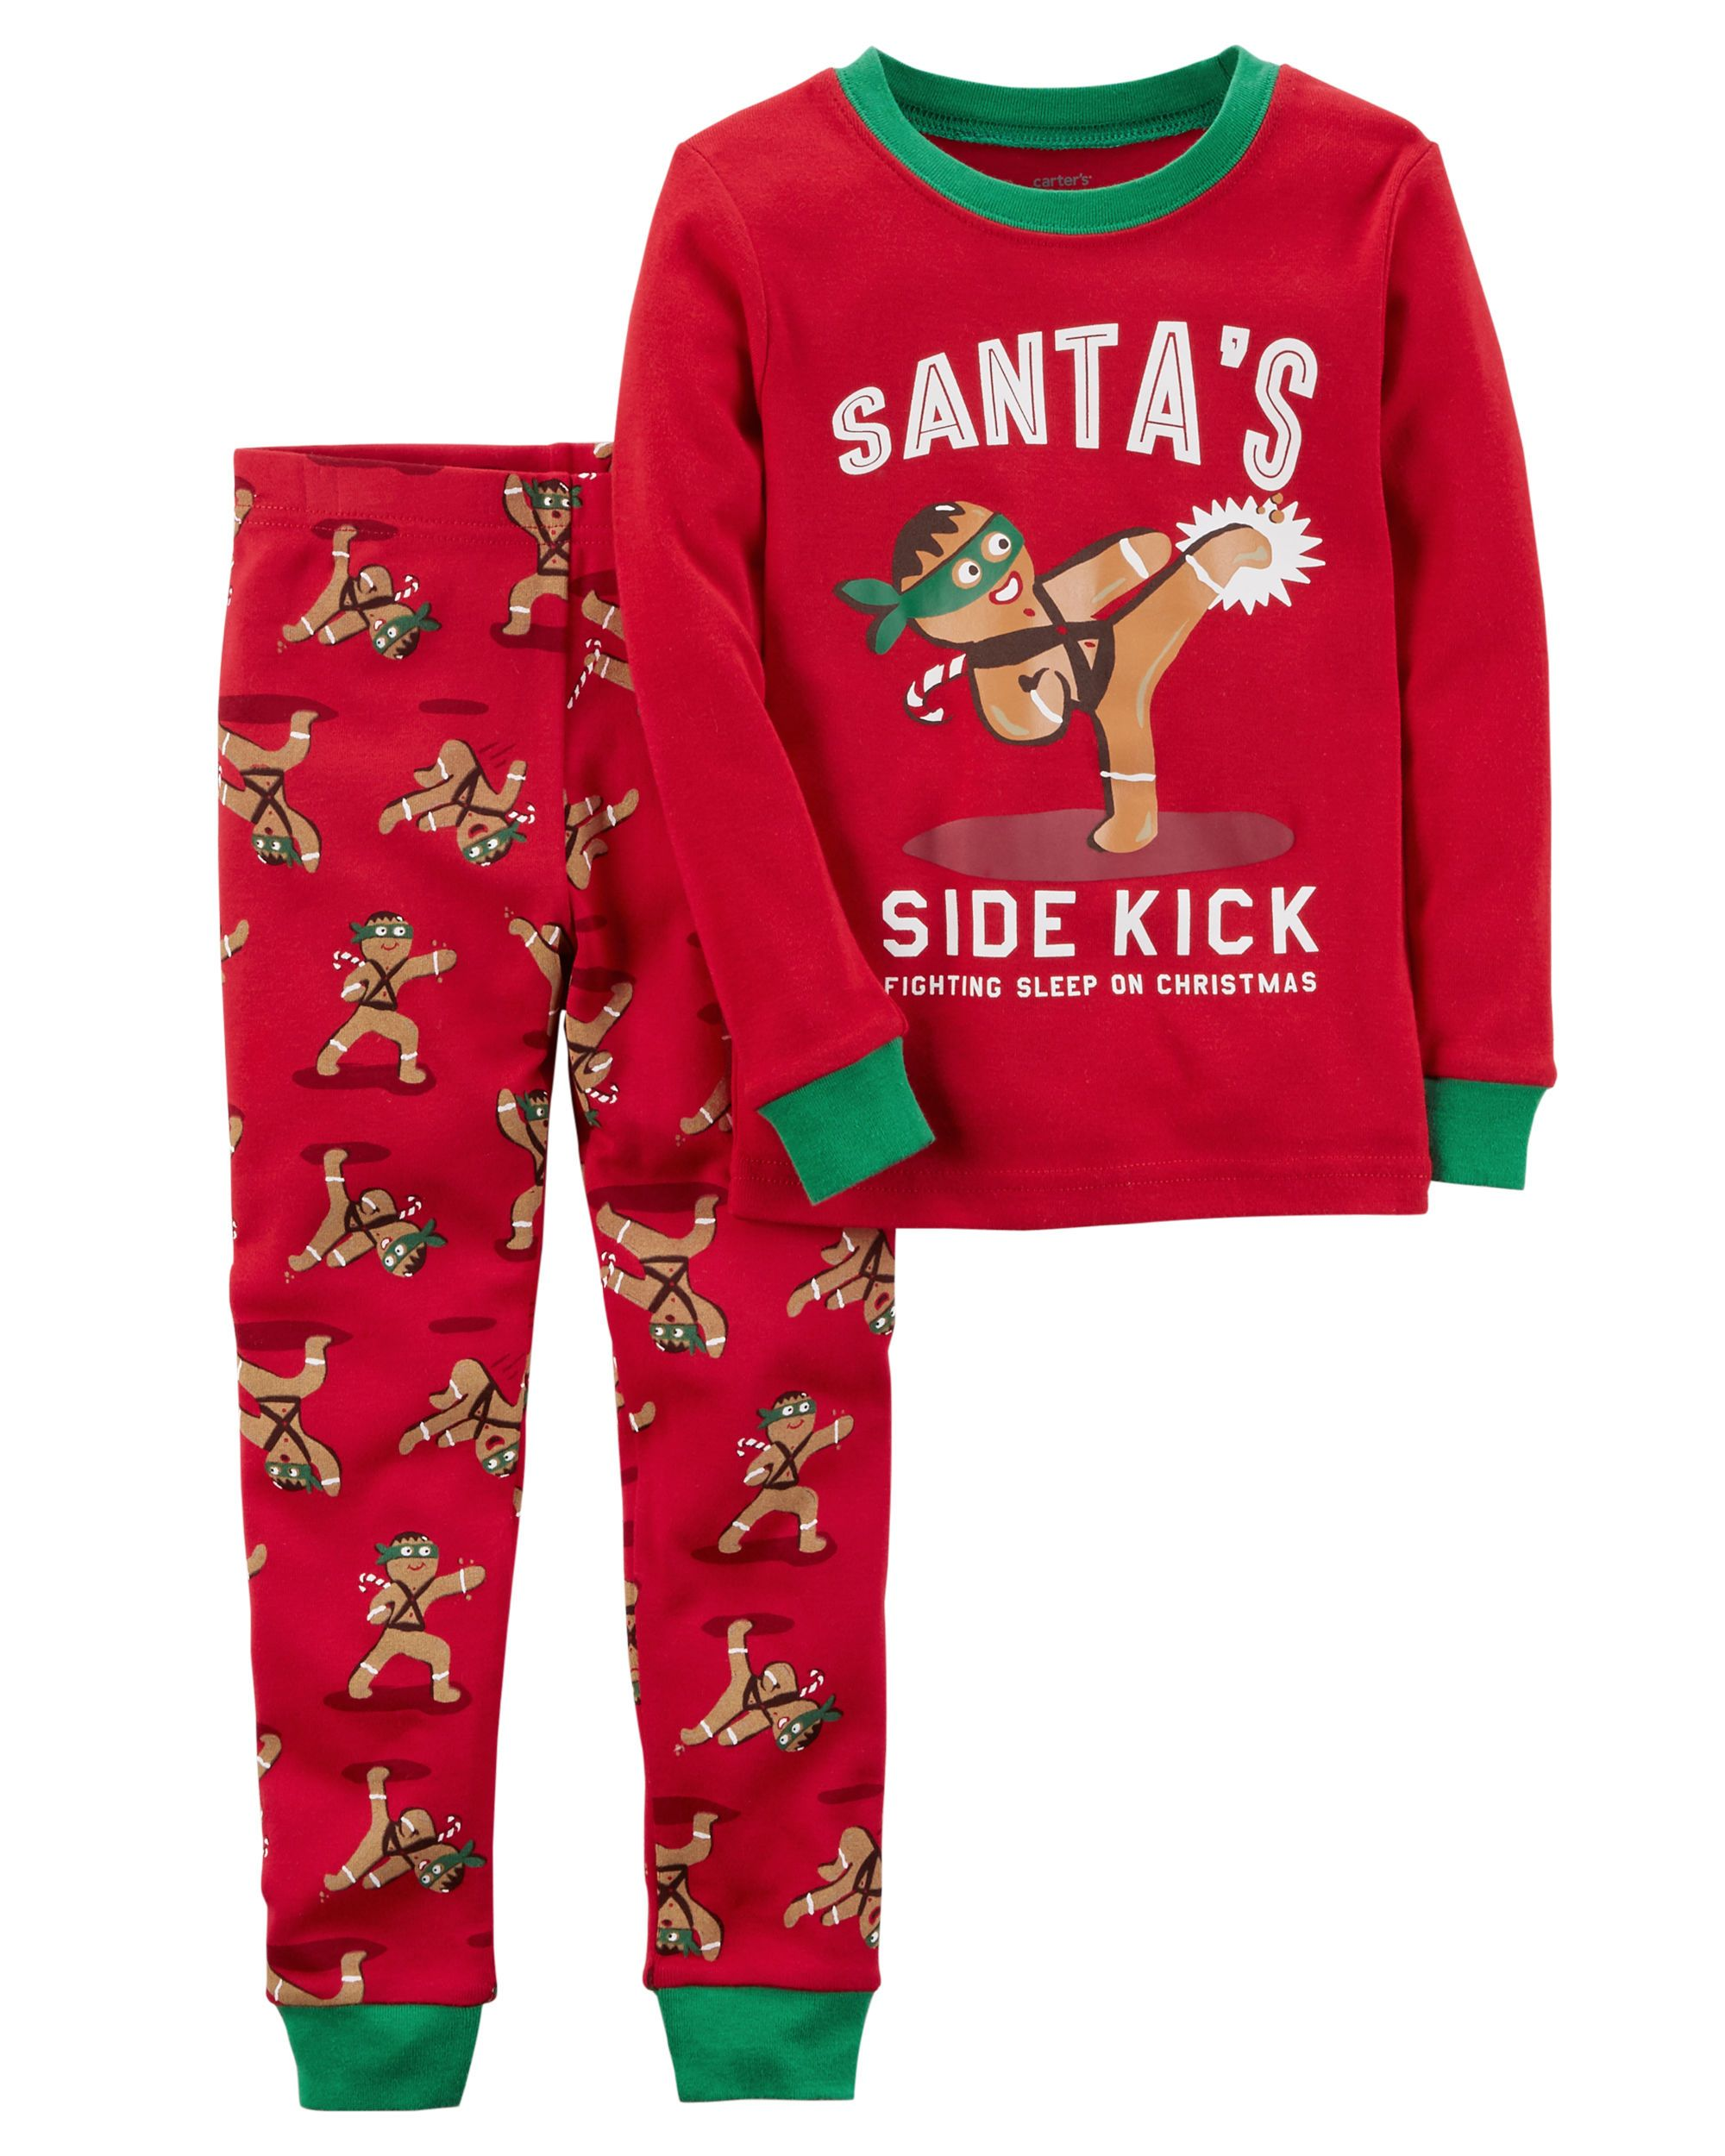 b2e957be8ffa 2-Piece Gingerbread Snug Fit Cotton PJs from Carters.com. Shop ...